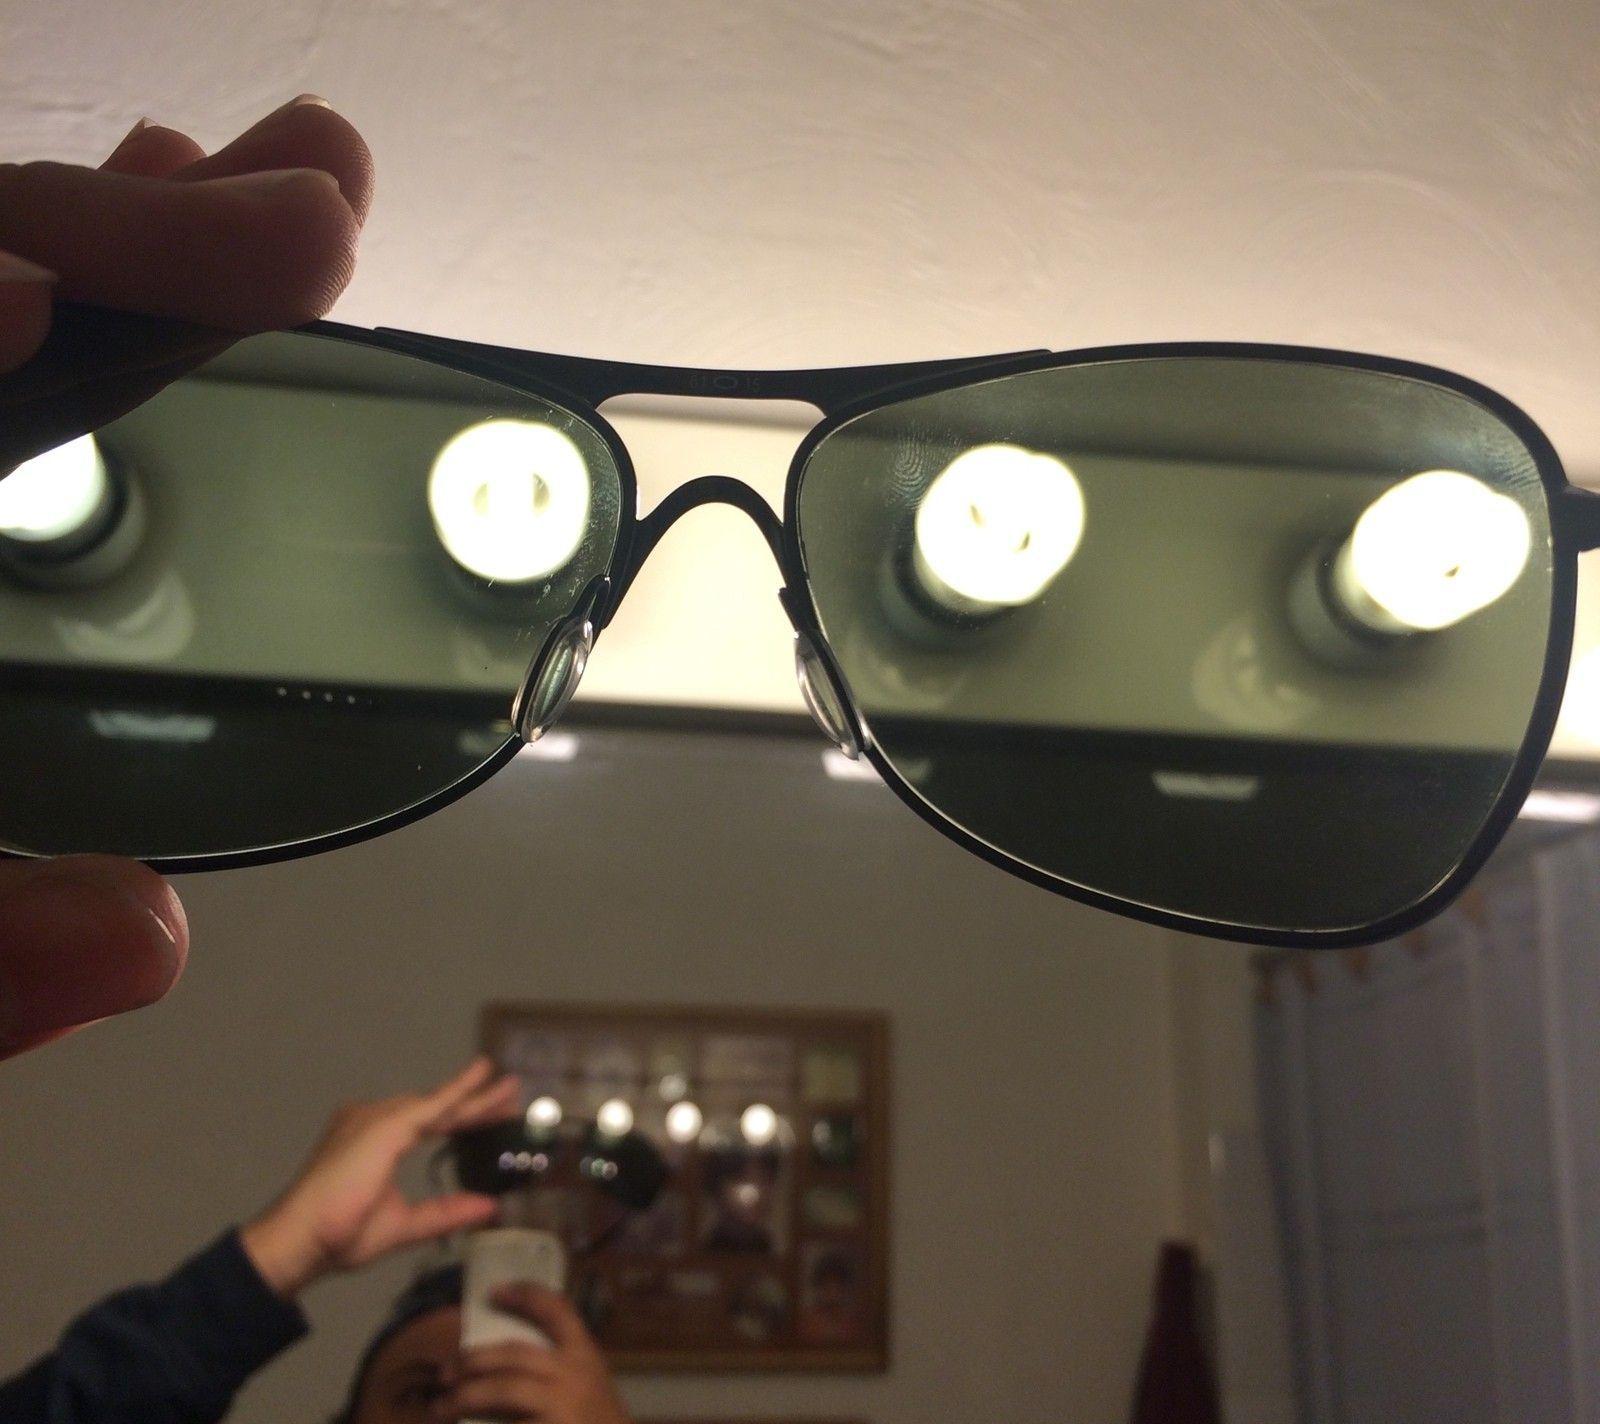 Crosshair 2012 - 2 pairs - under $99 - 2015-12-06 20.38.43.jpg